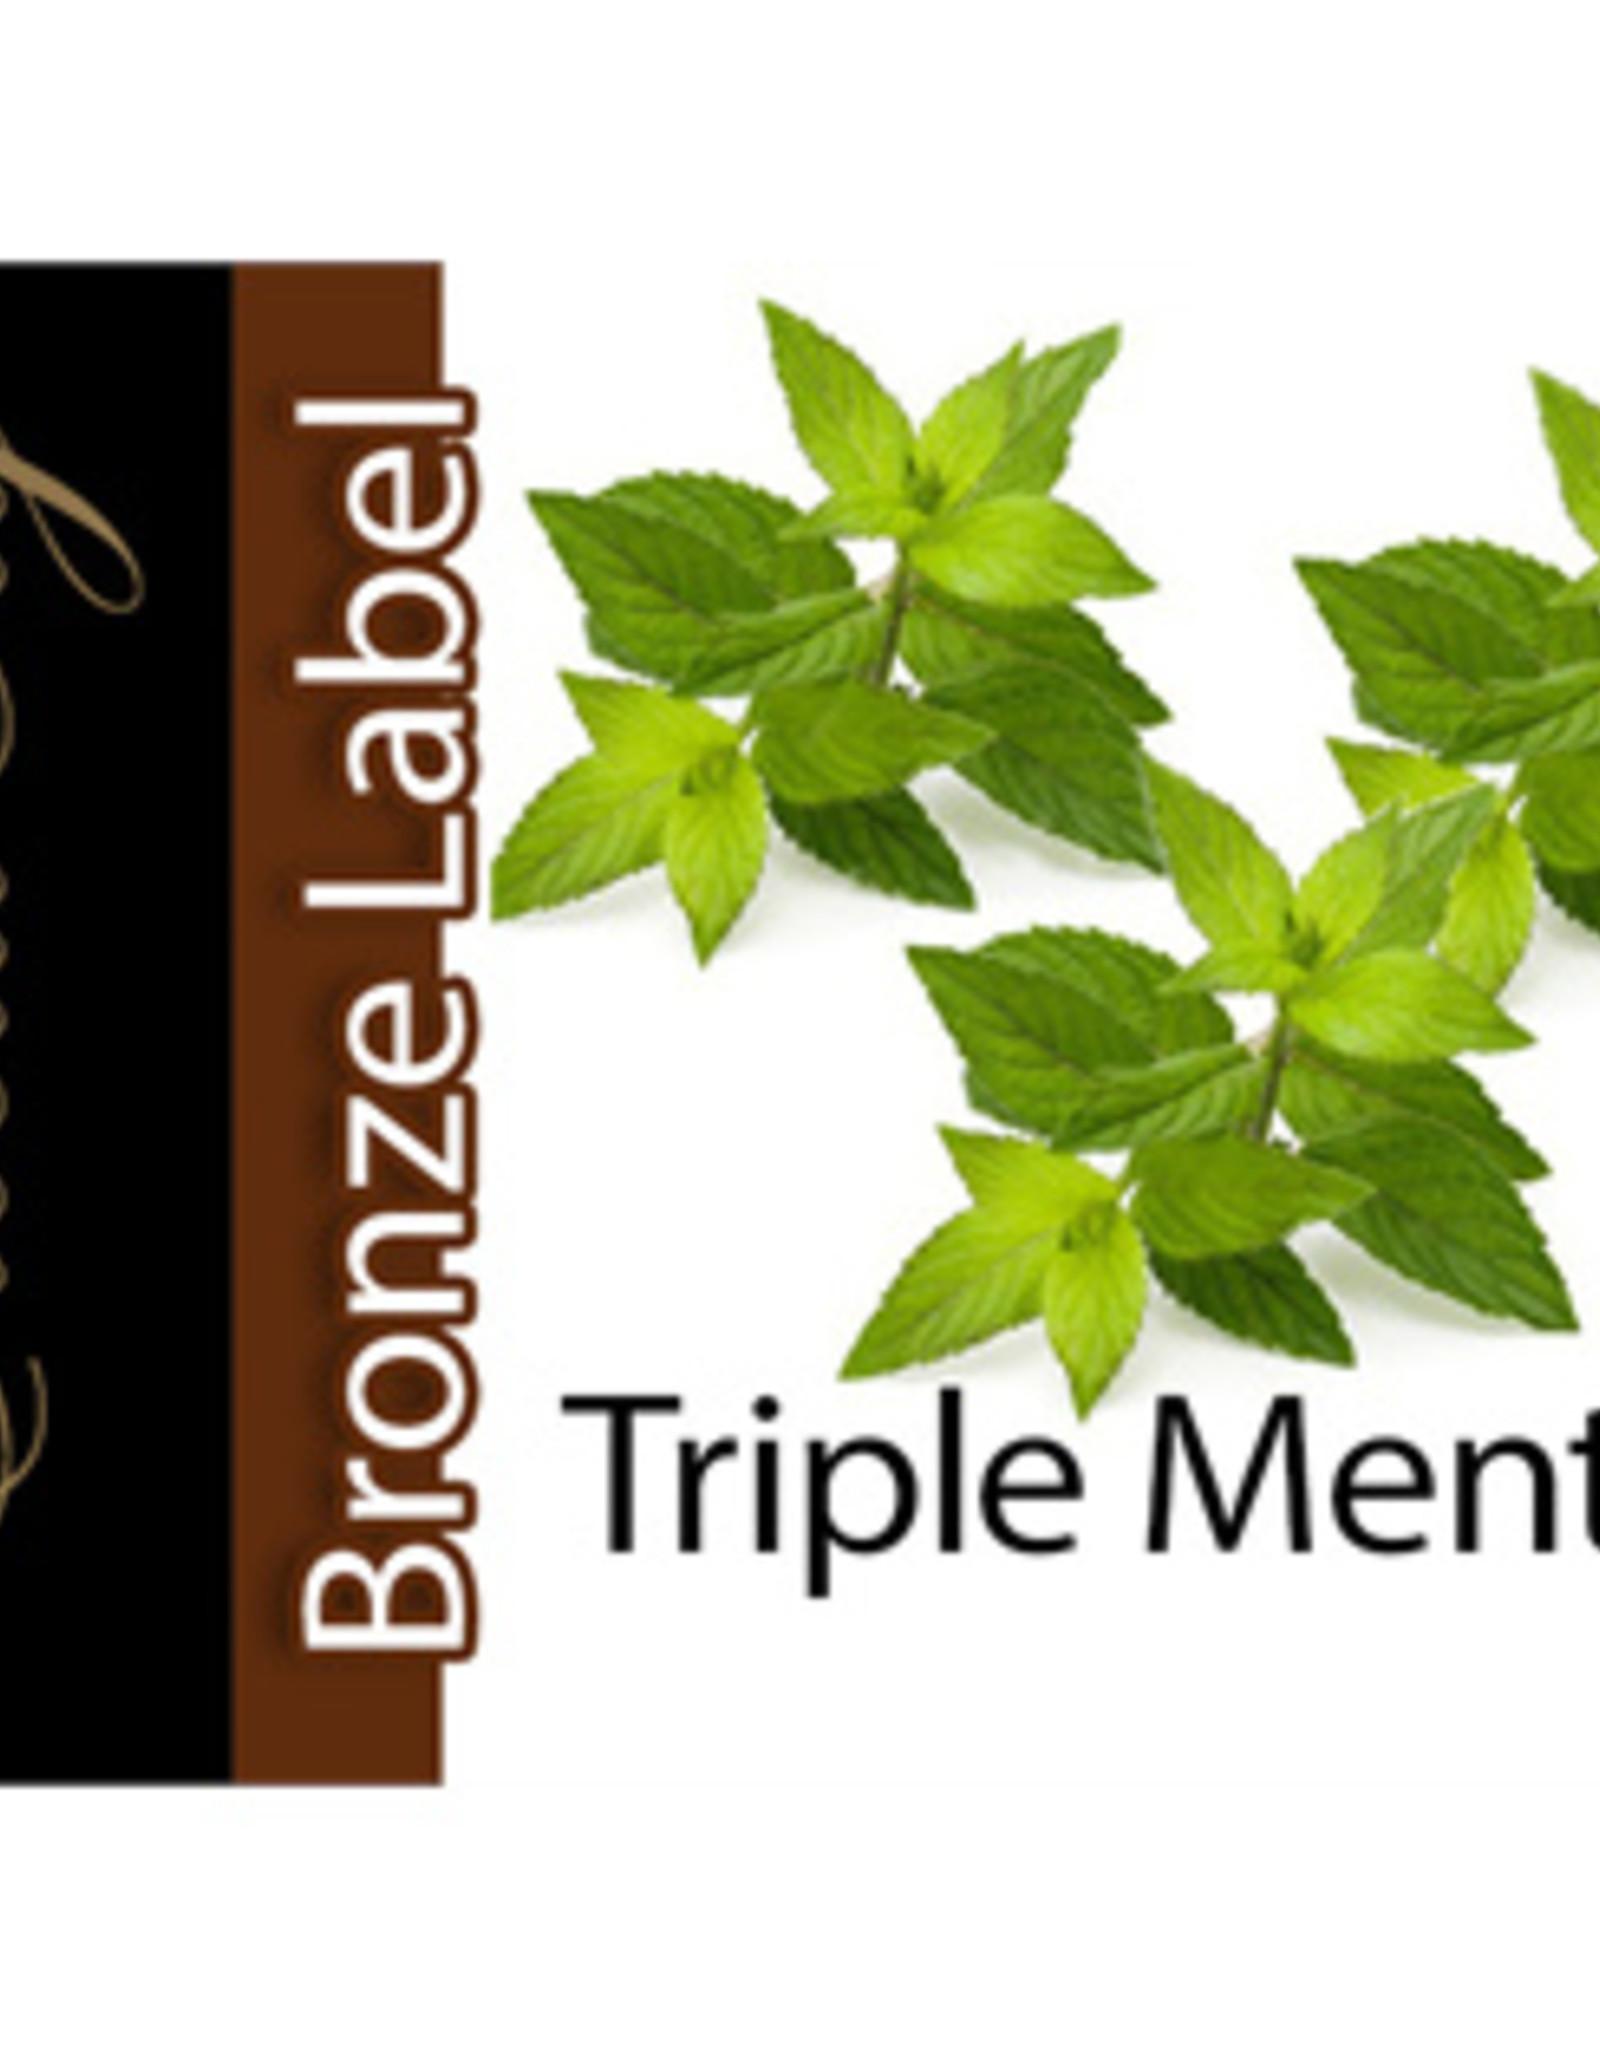 Exclucig Exclucig Bronze Label E-liquid Triple Menthol 6 mg Nicotine